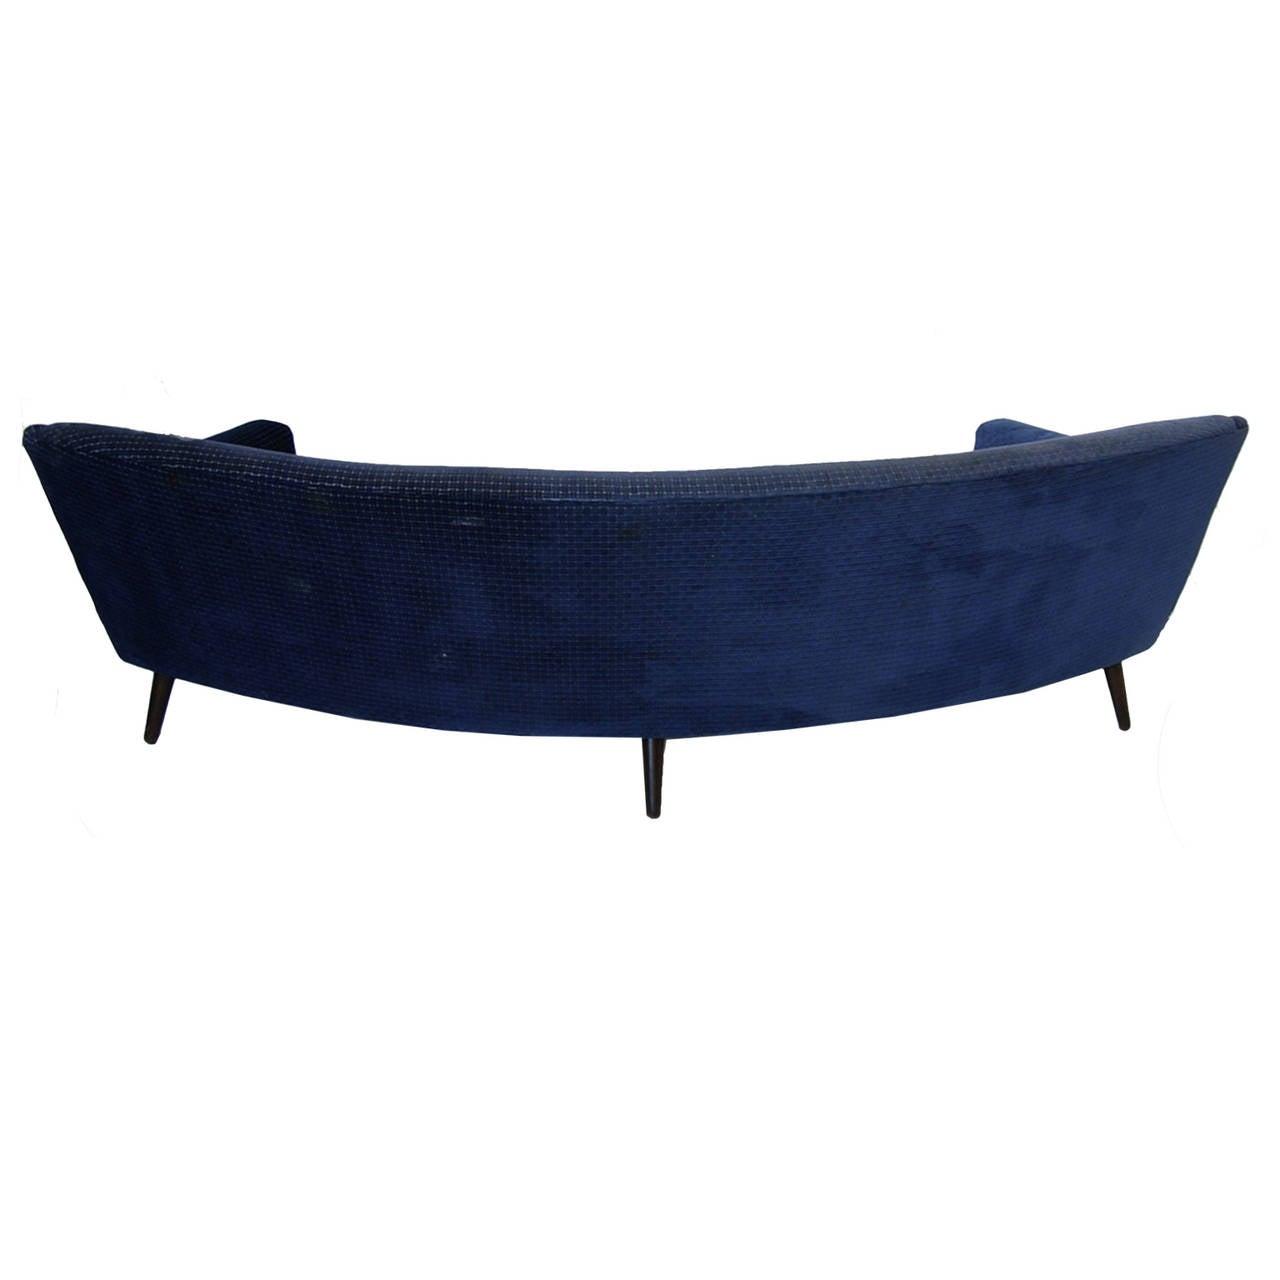 Scandinavian Modern Rare Kurt Ostervig for Henry Rolschau Mobler Curved Sofa For Sale